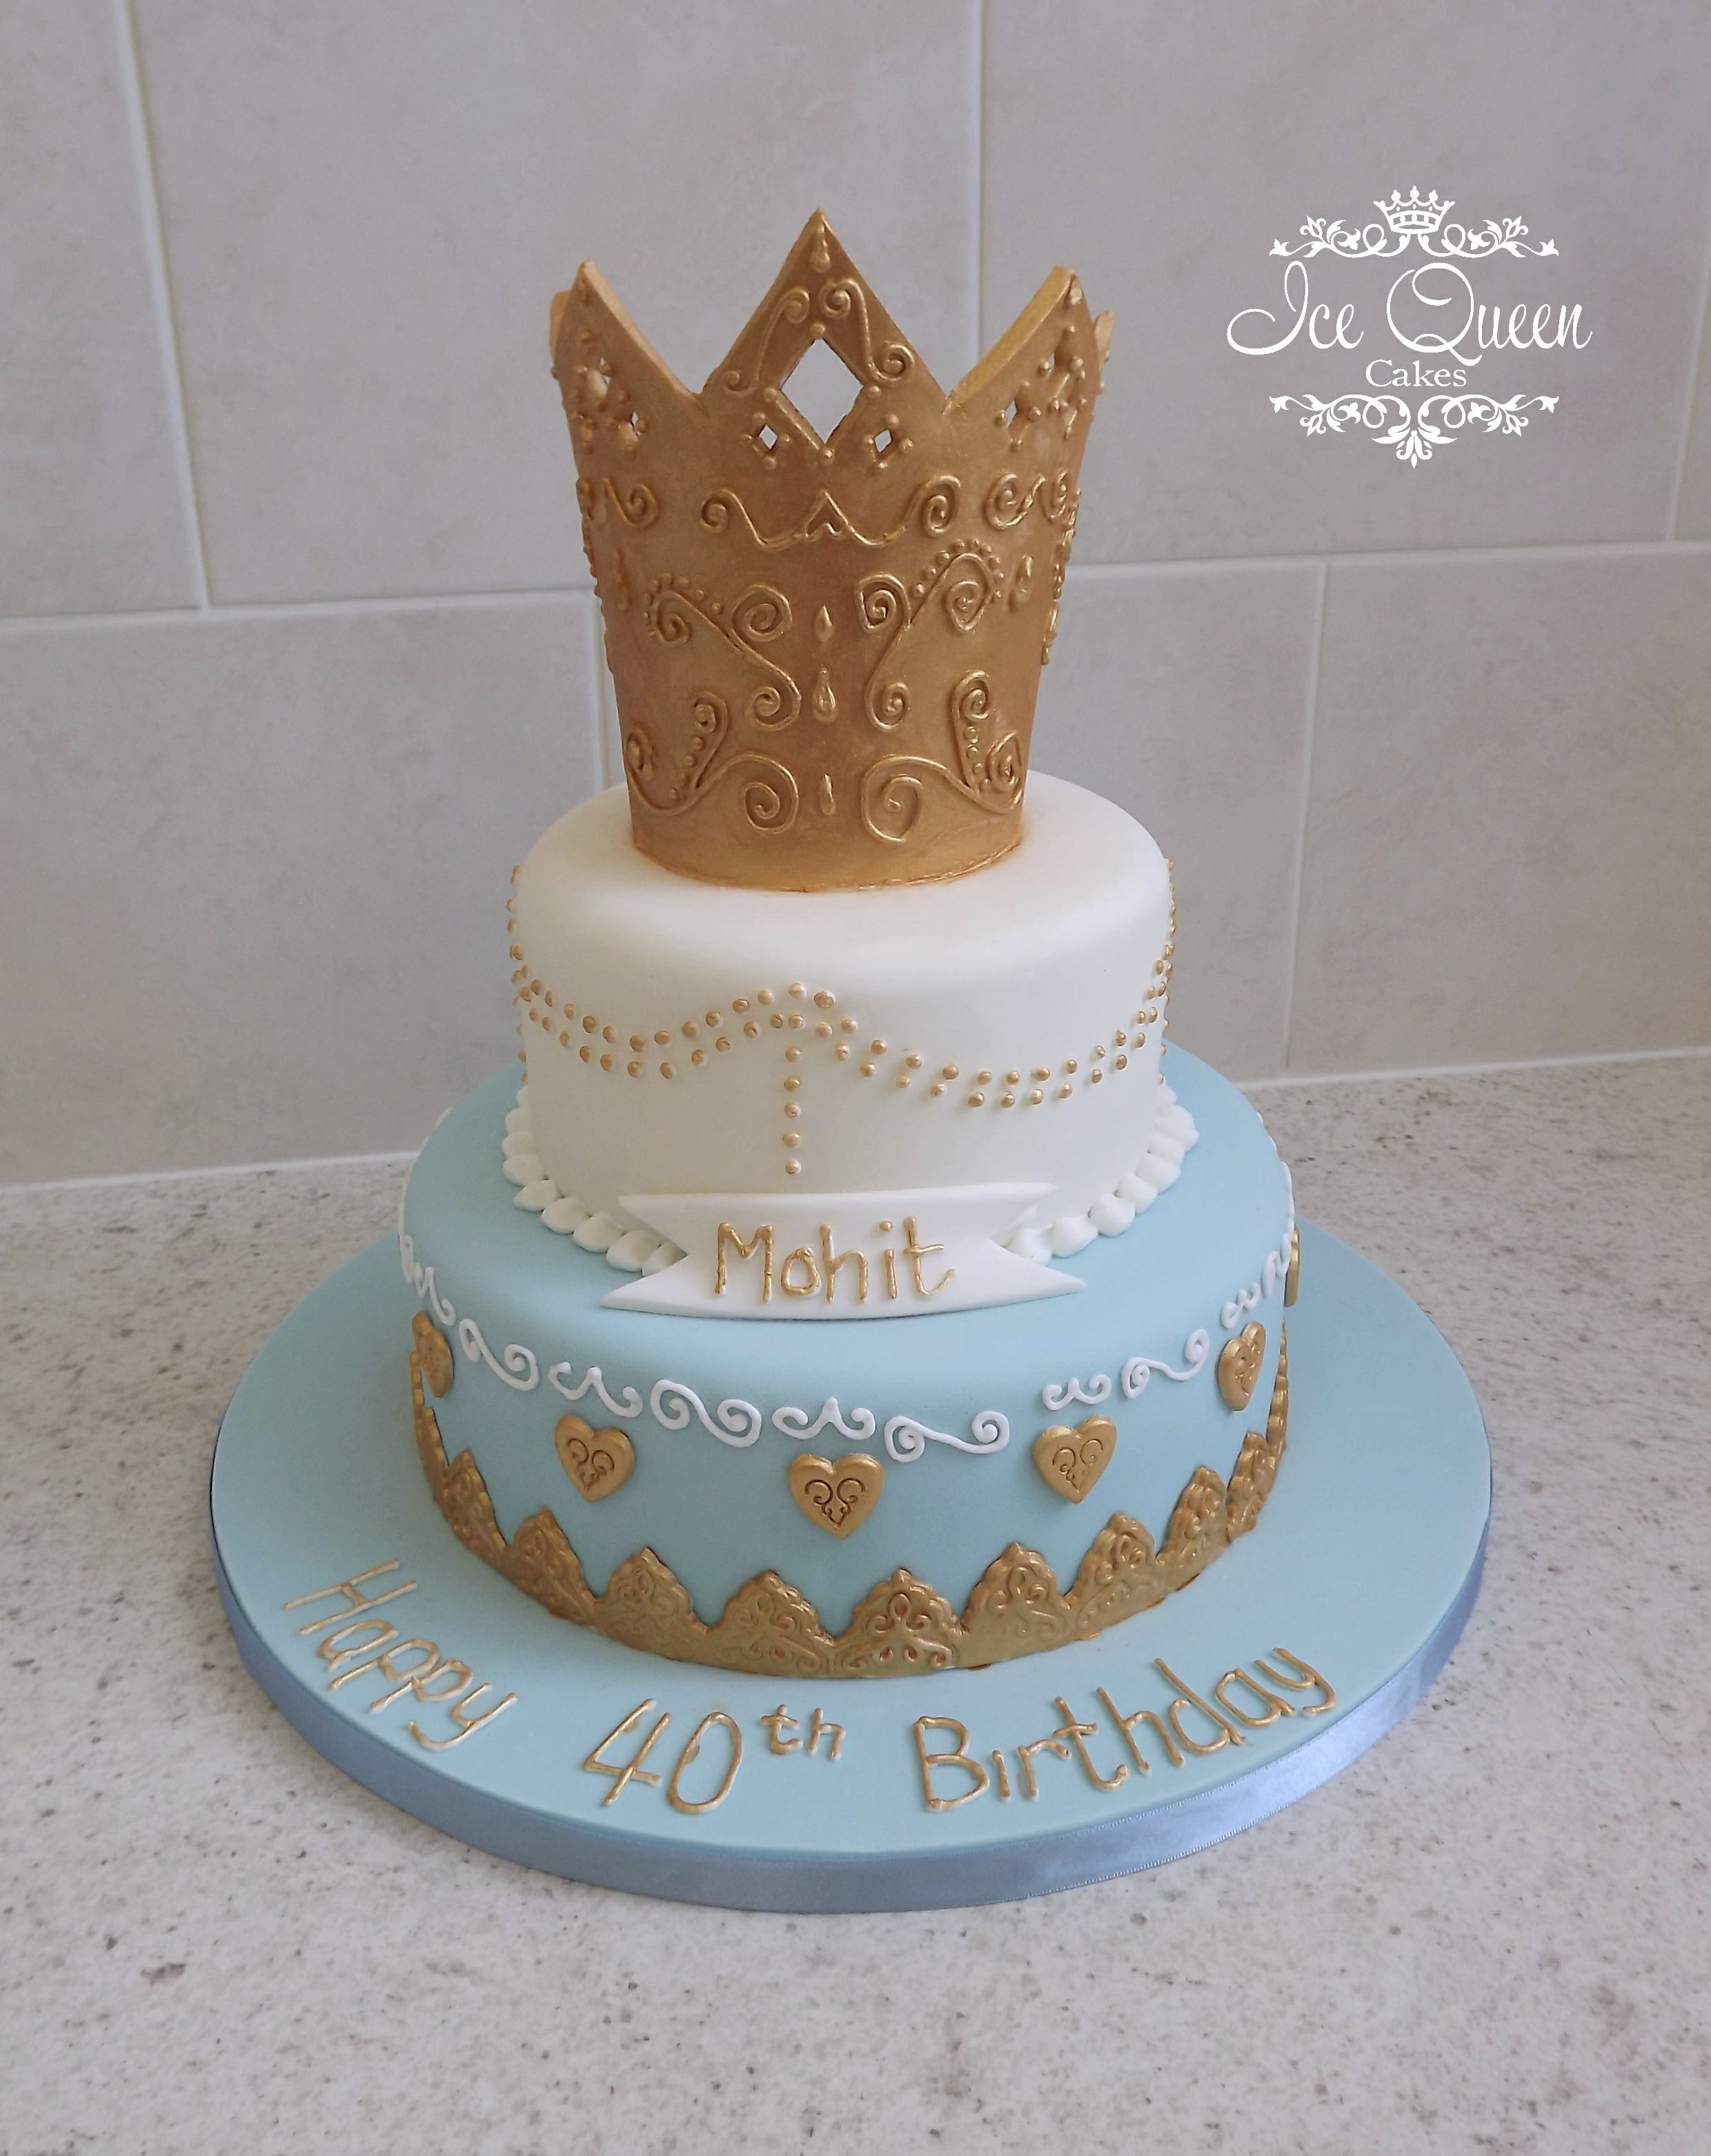 2 tier and crown birthday cake Ice Queen Cakes Designer wedding